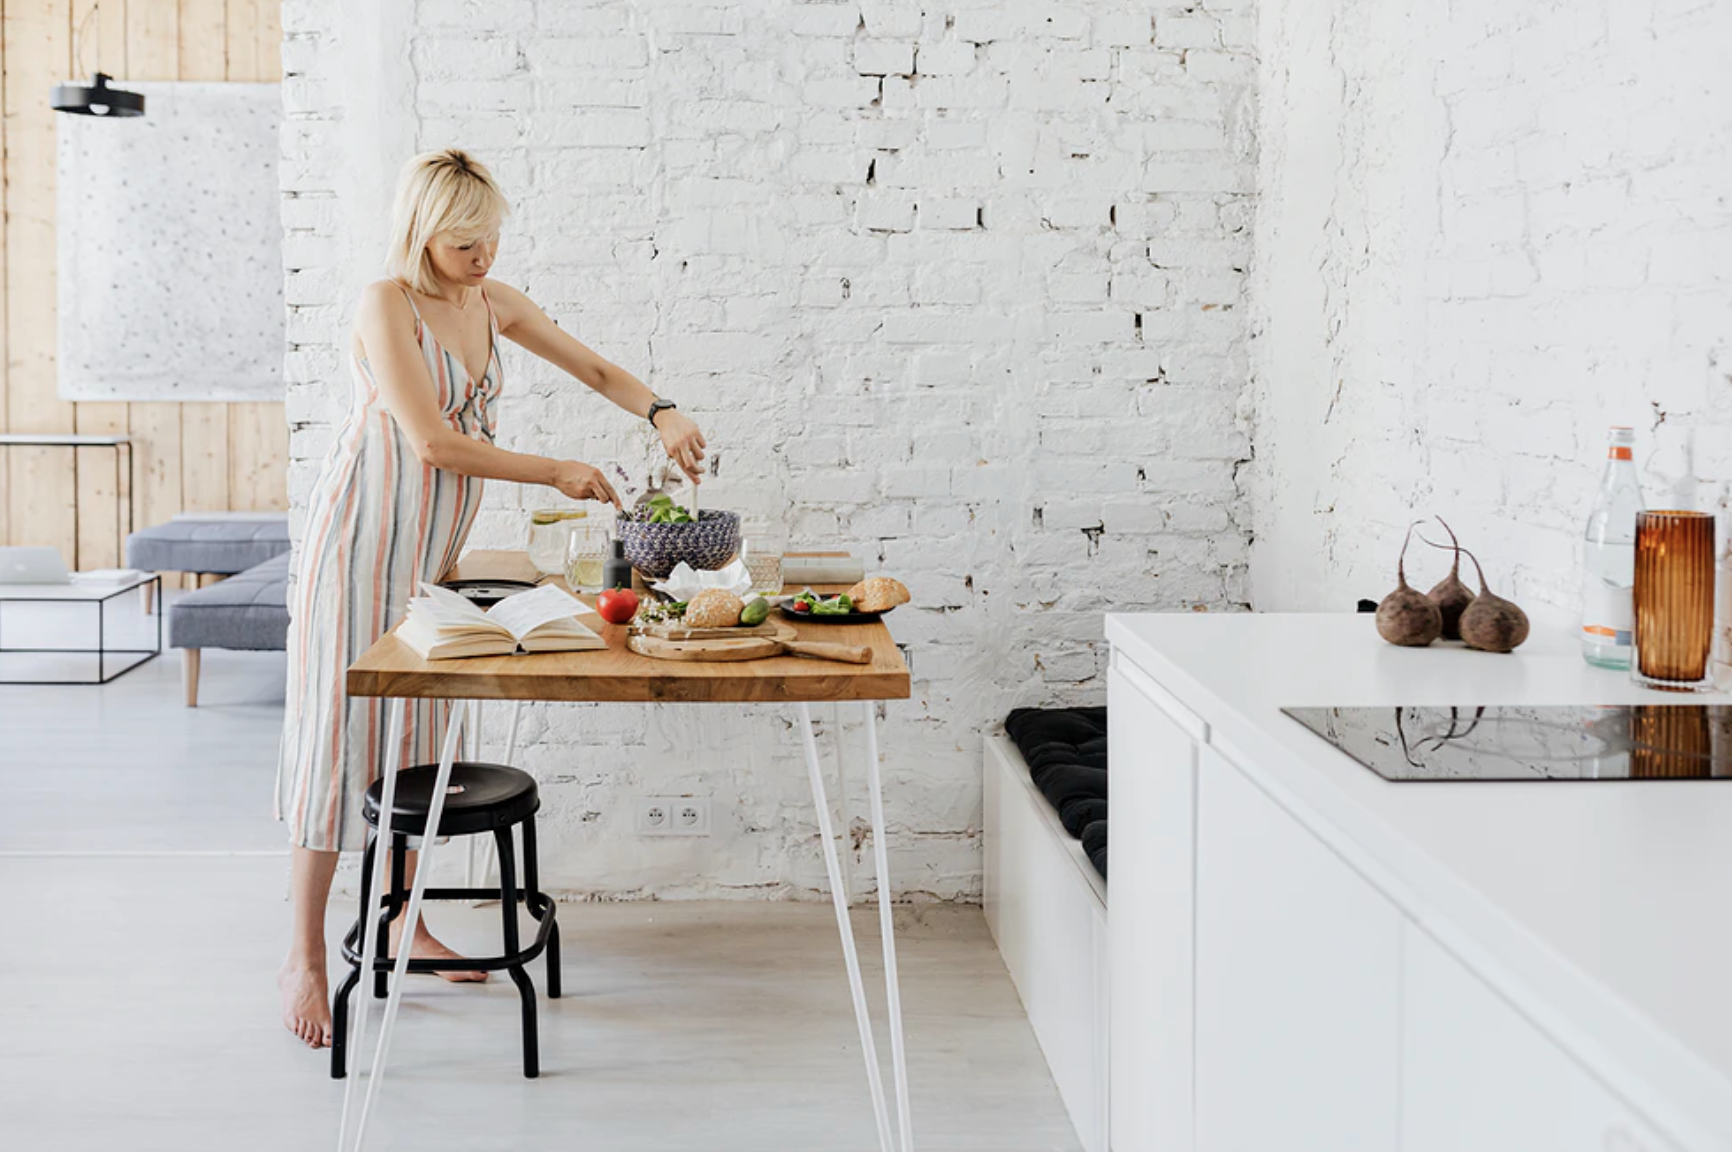 Au pair bereid eten voor gastgezin in mooi witte keuken op uitwisselingprogramma van au pair bureau